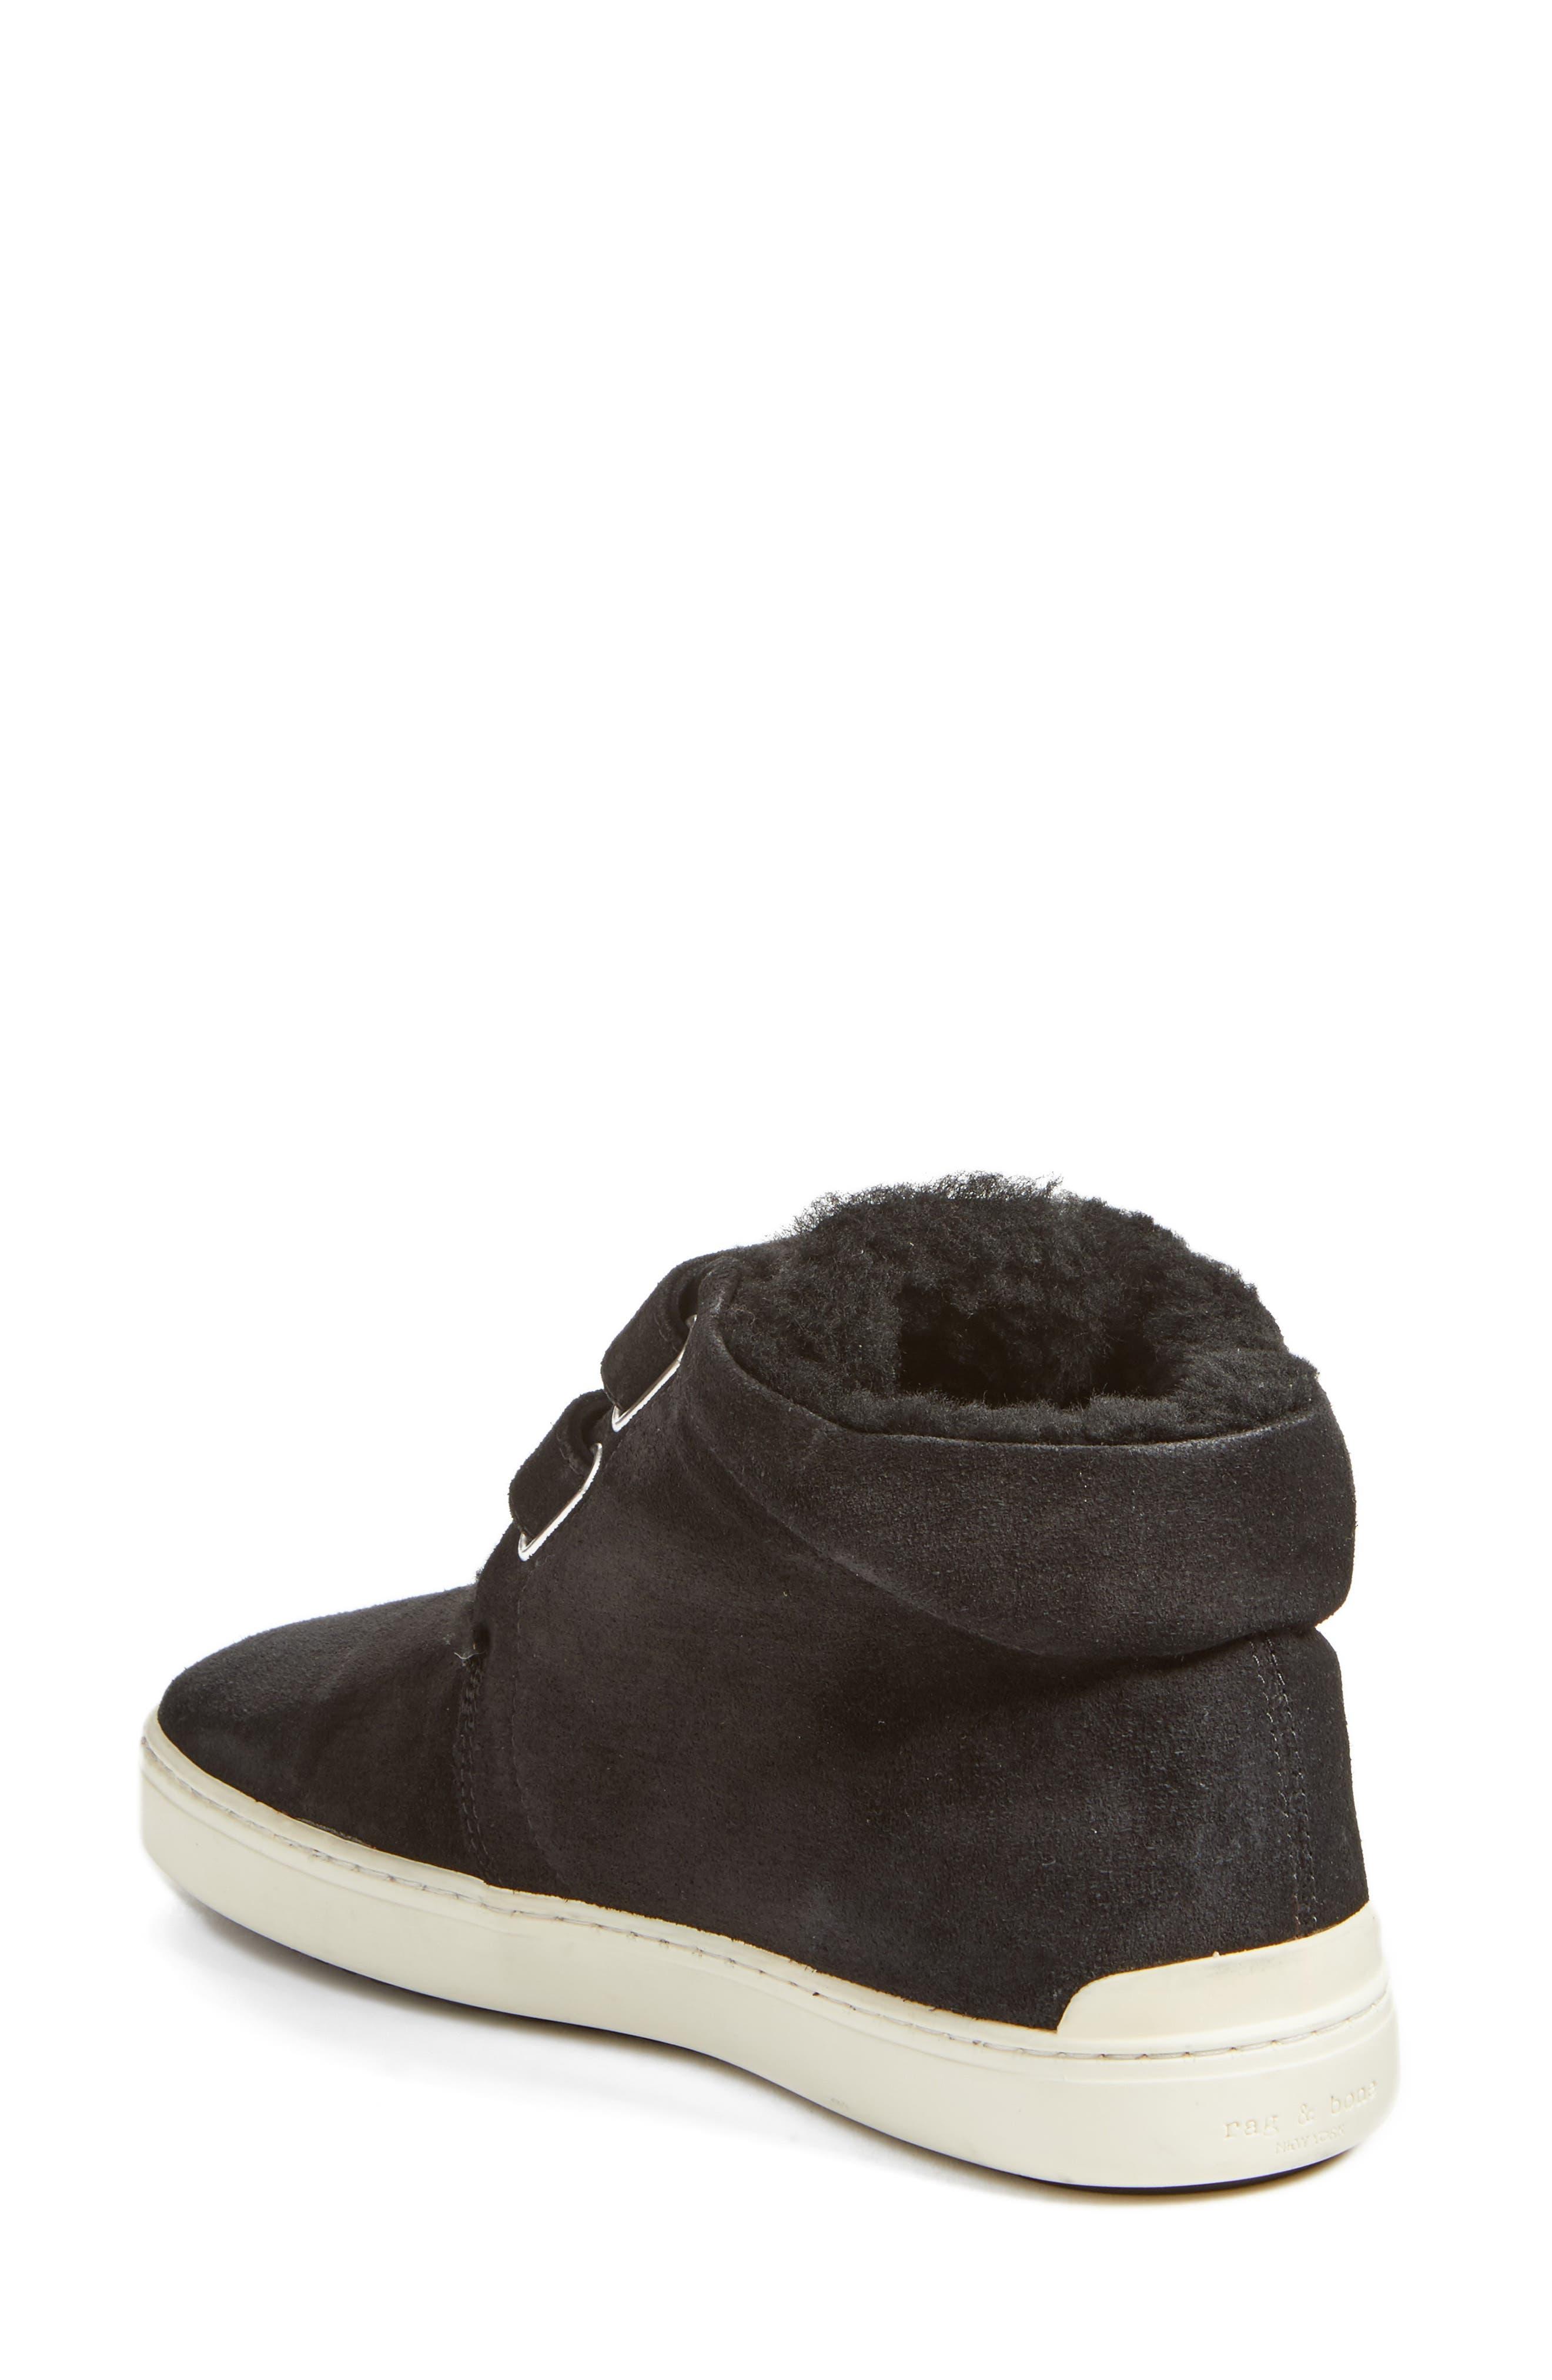 Kent Genuine Shearling Lined Sneaker,                             Alternate thumbnail 2, color,                             008